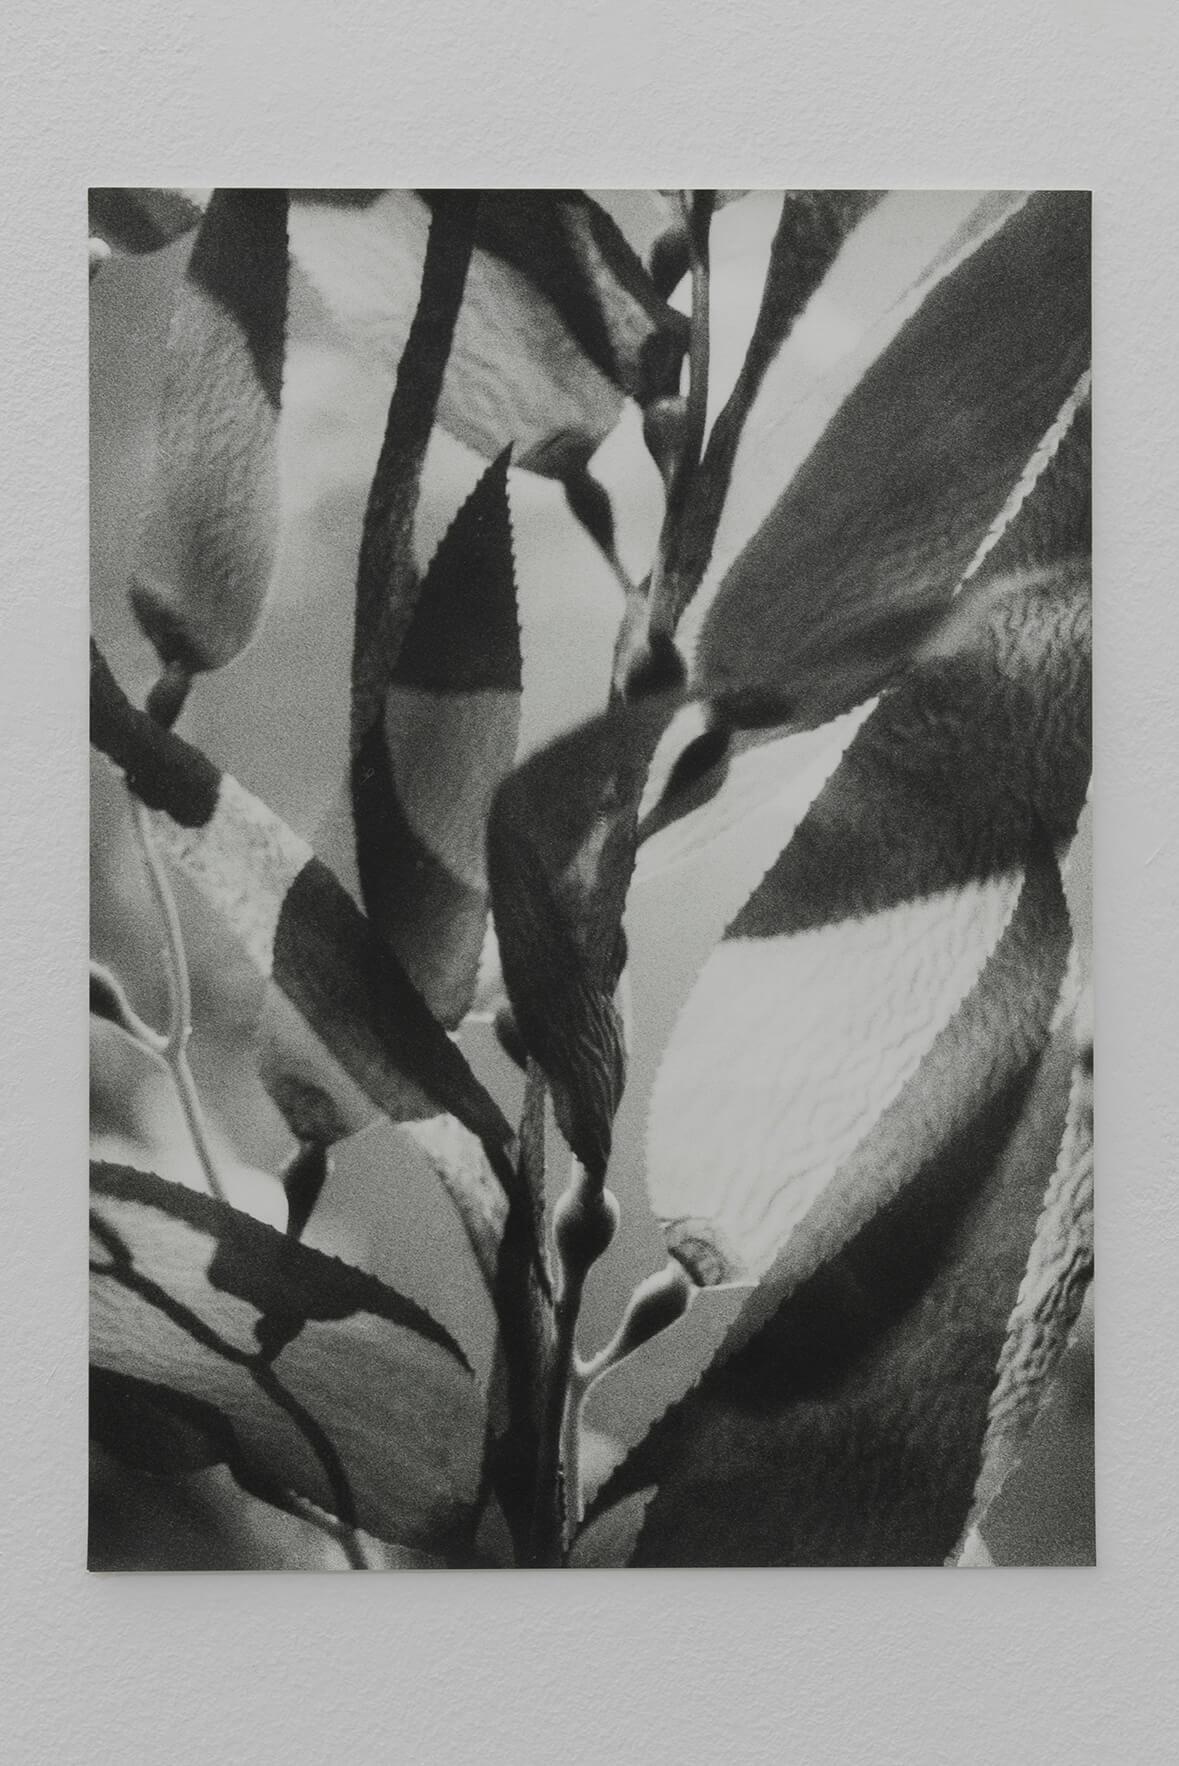 Untitled (Kelp), 2015 | Zostera & Posidonia | ProjecteSD